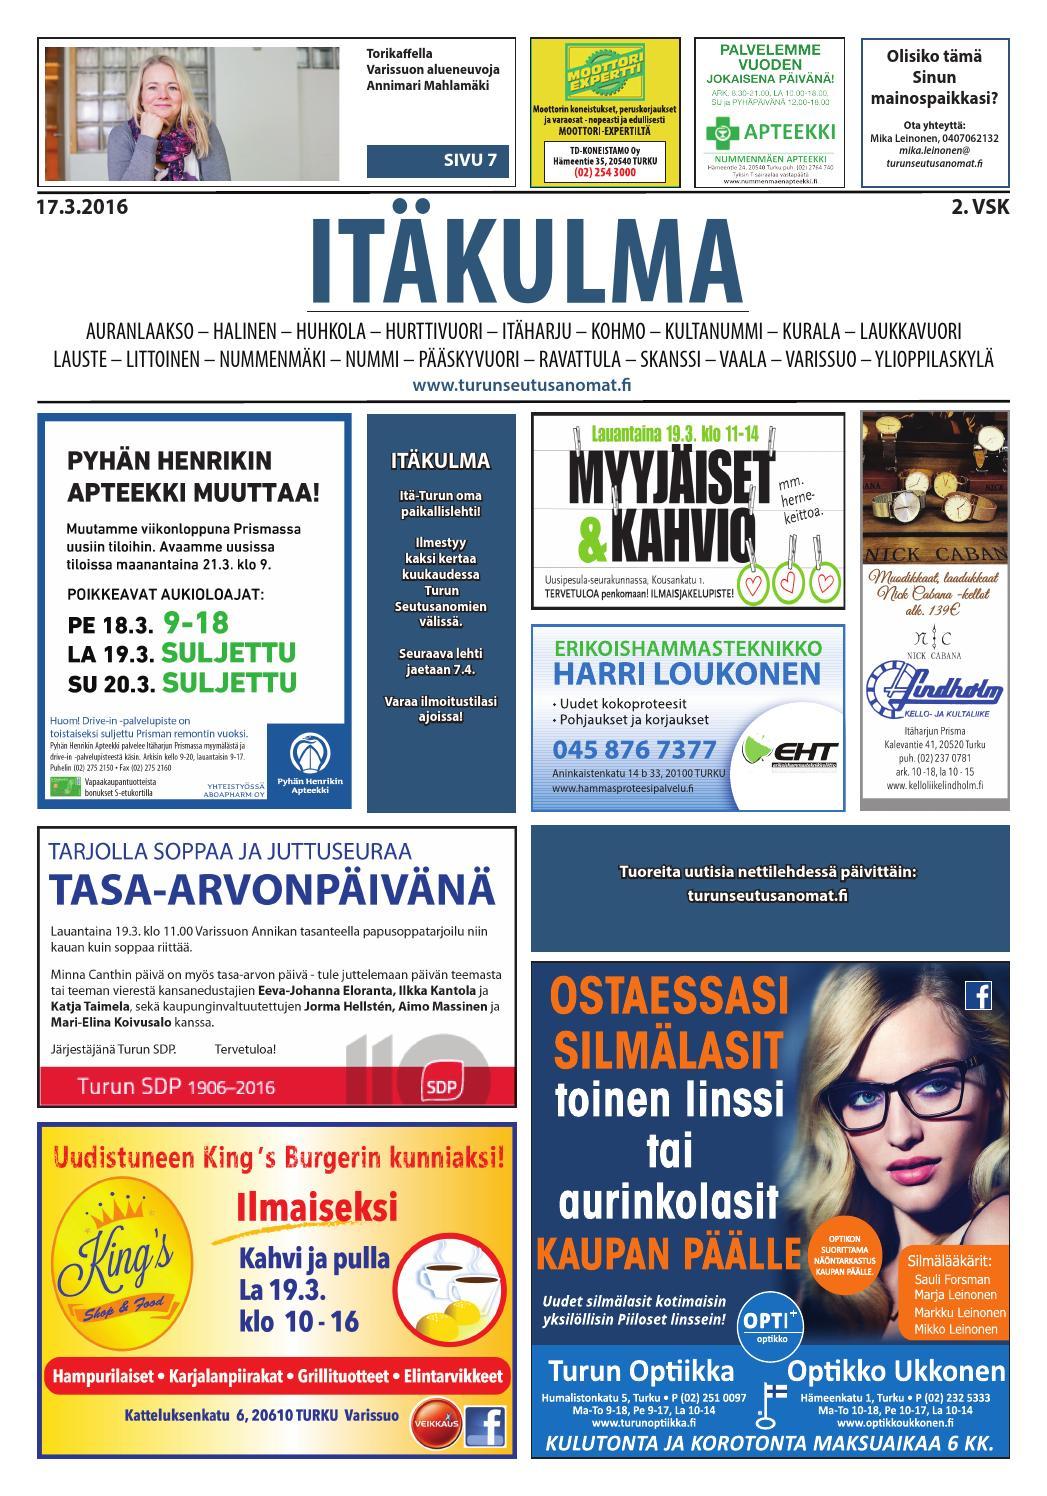 Hurttivuori Turku